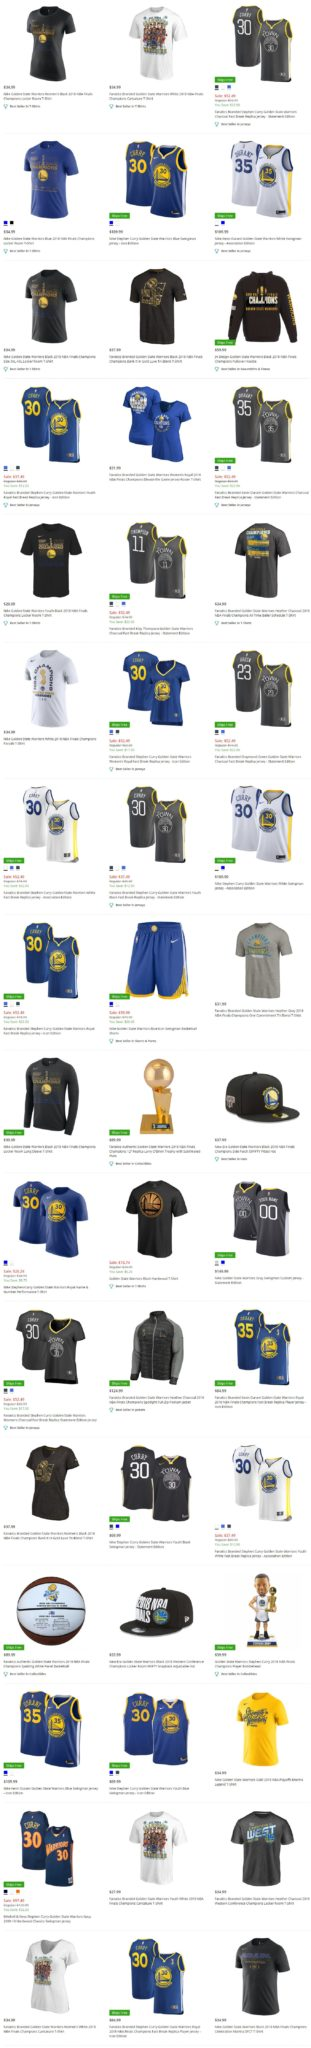 Golden State Warriors Apparel, GSW Team Store \u2013 FATHERS DAY Top 10 Deals \u2013  Groupon, Amazon, Airfare, etc